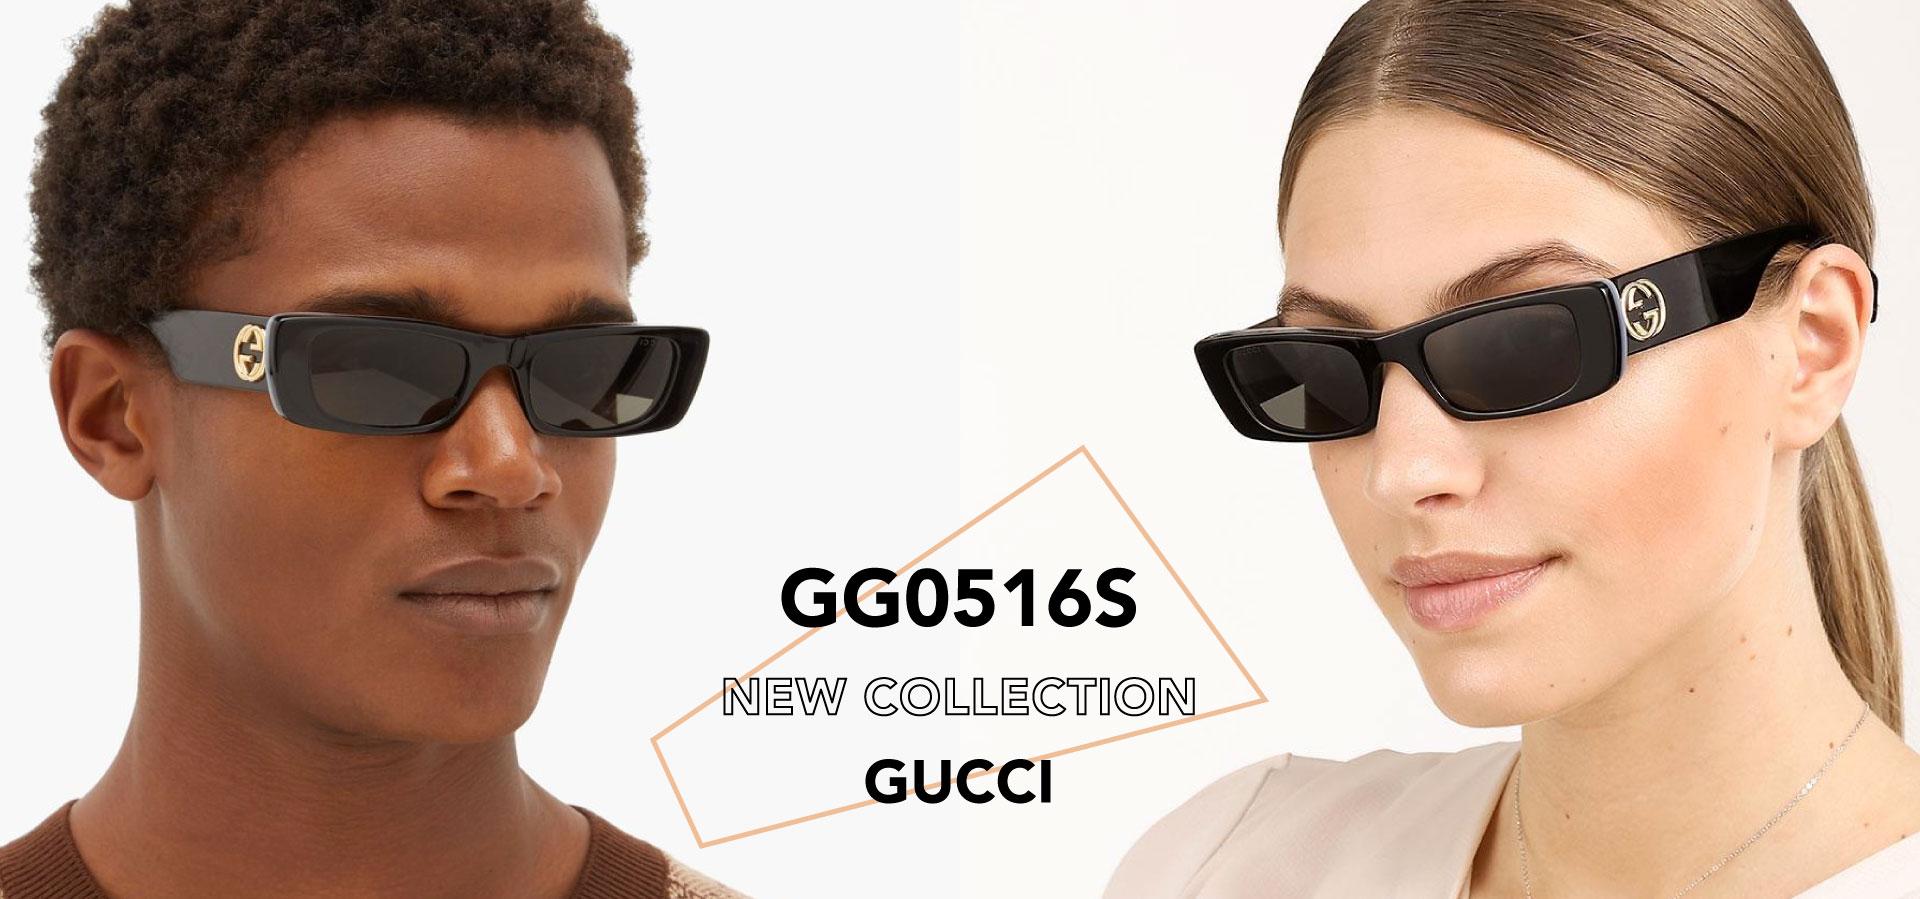 Gucci Sunglasses   New Collection